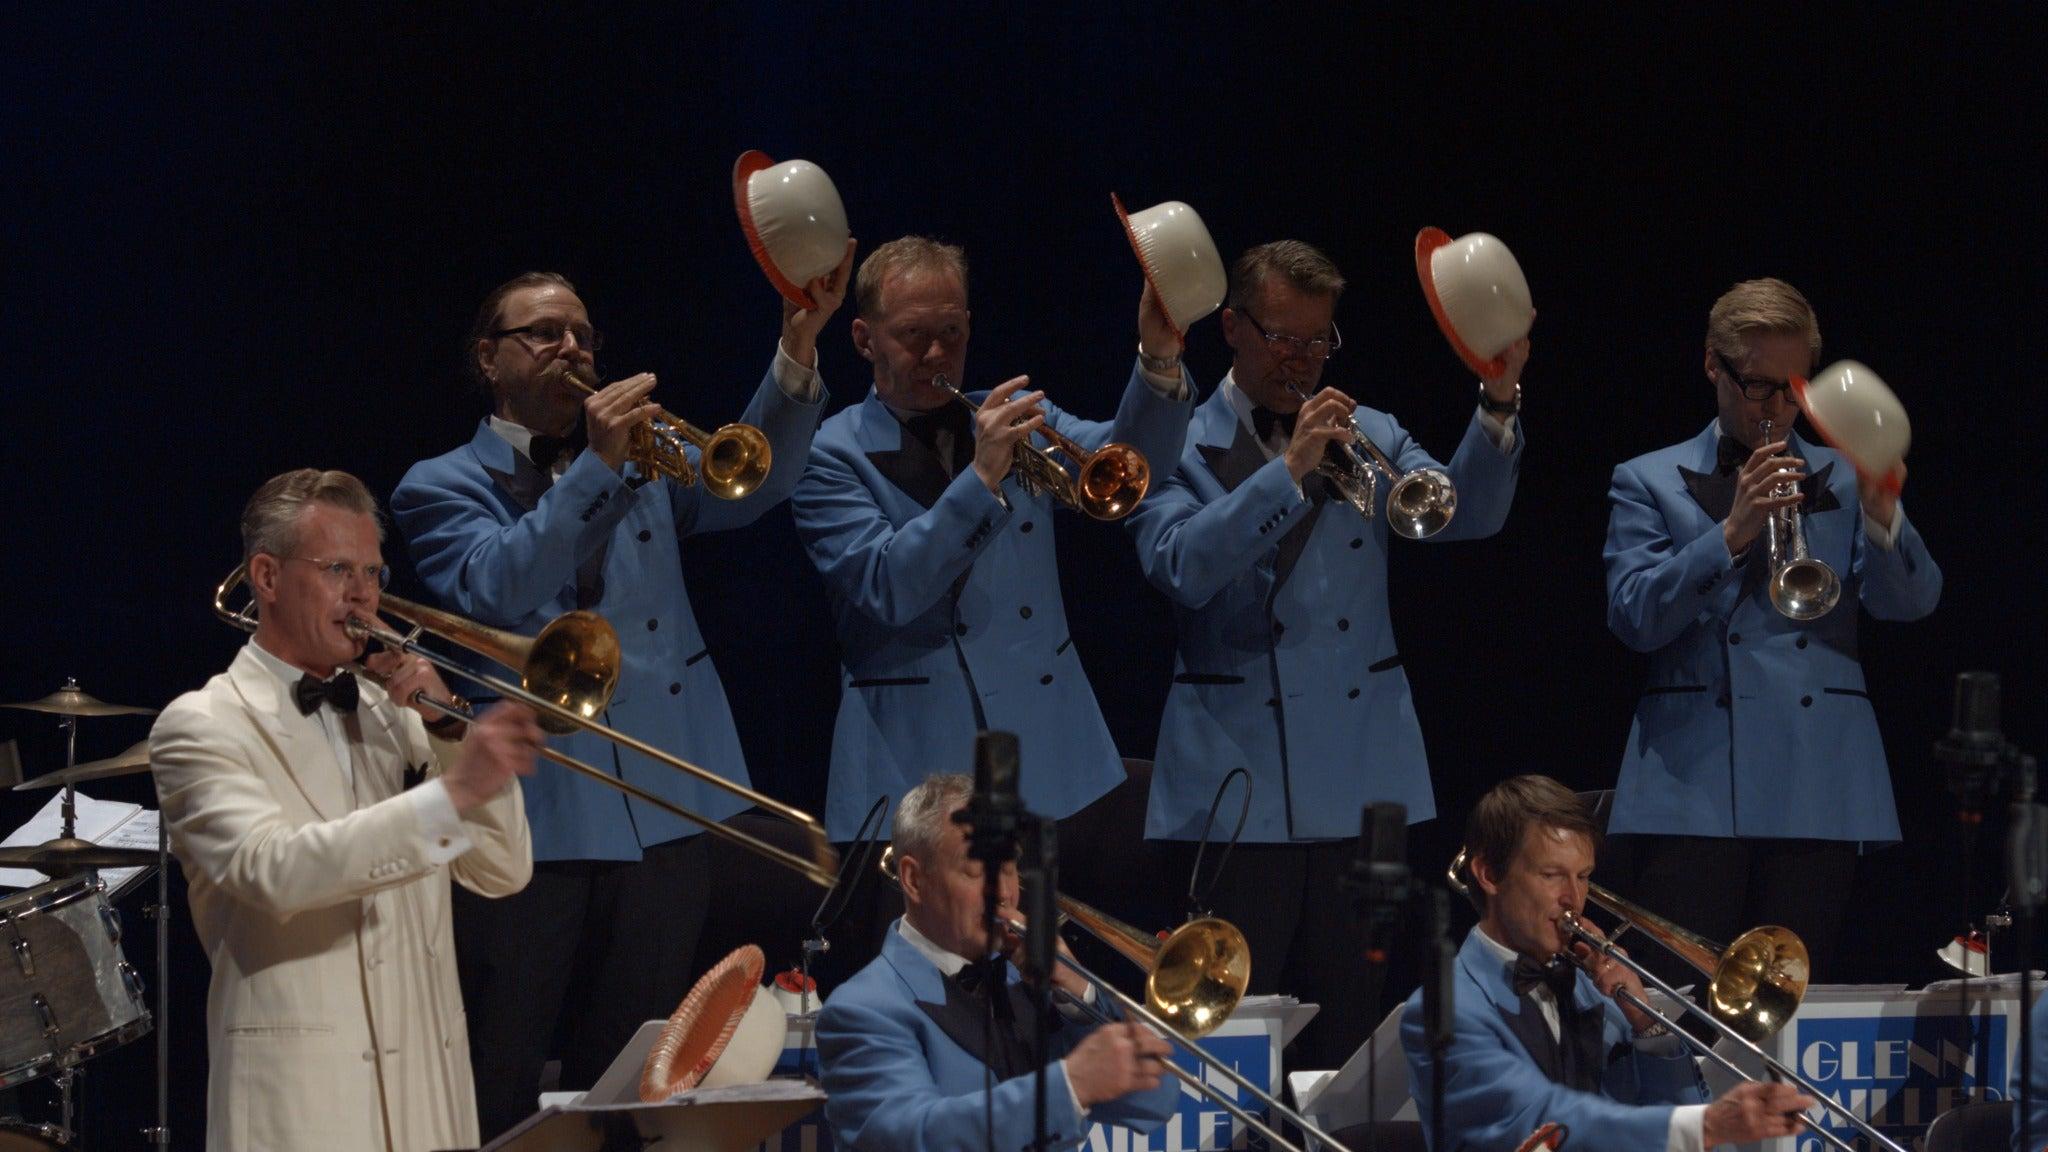 Glenn Miller Orchestra at Chandler Center for the Arts